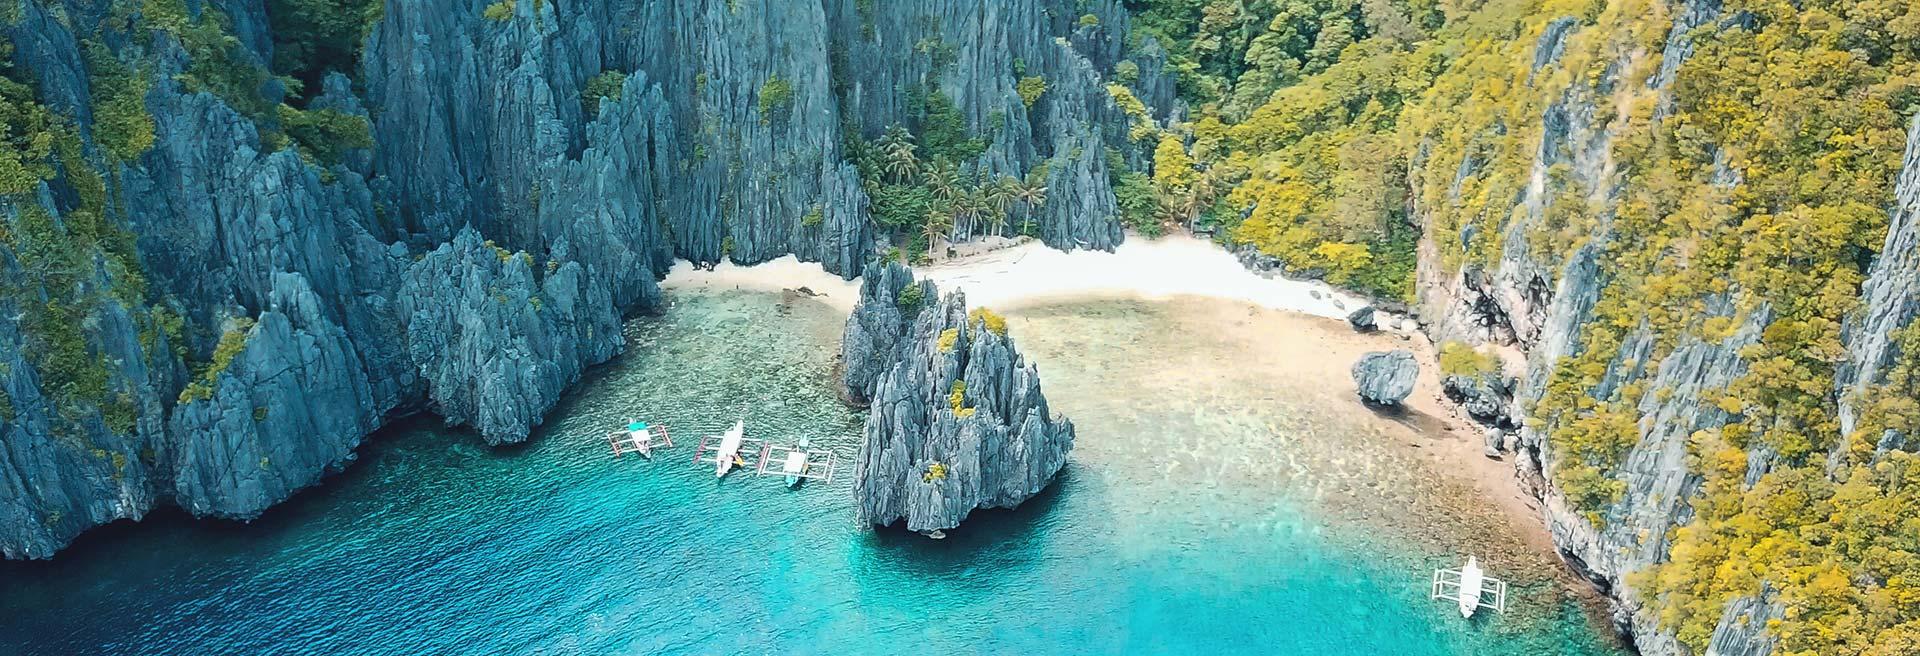 Reise Dich frei • Palawan Philippinen • Reiseguide